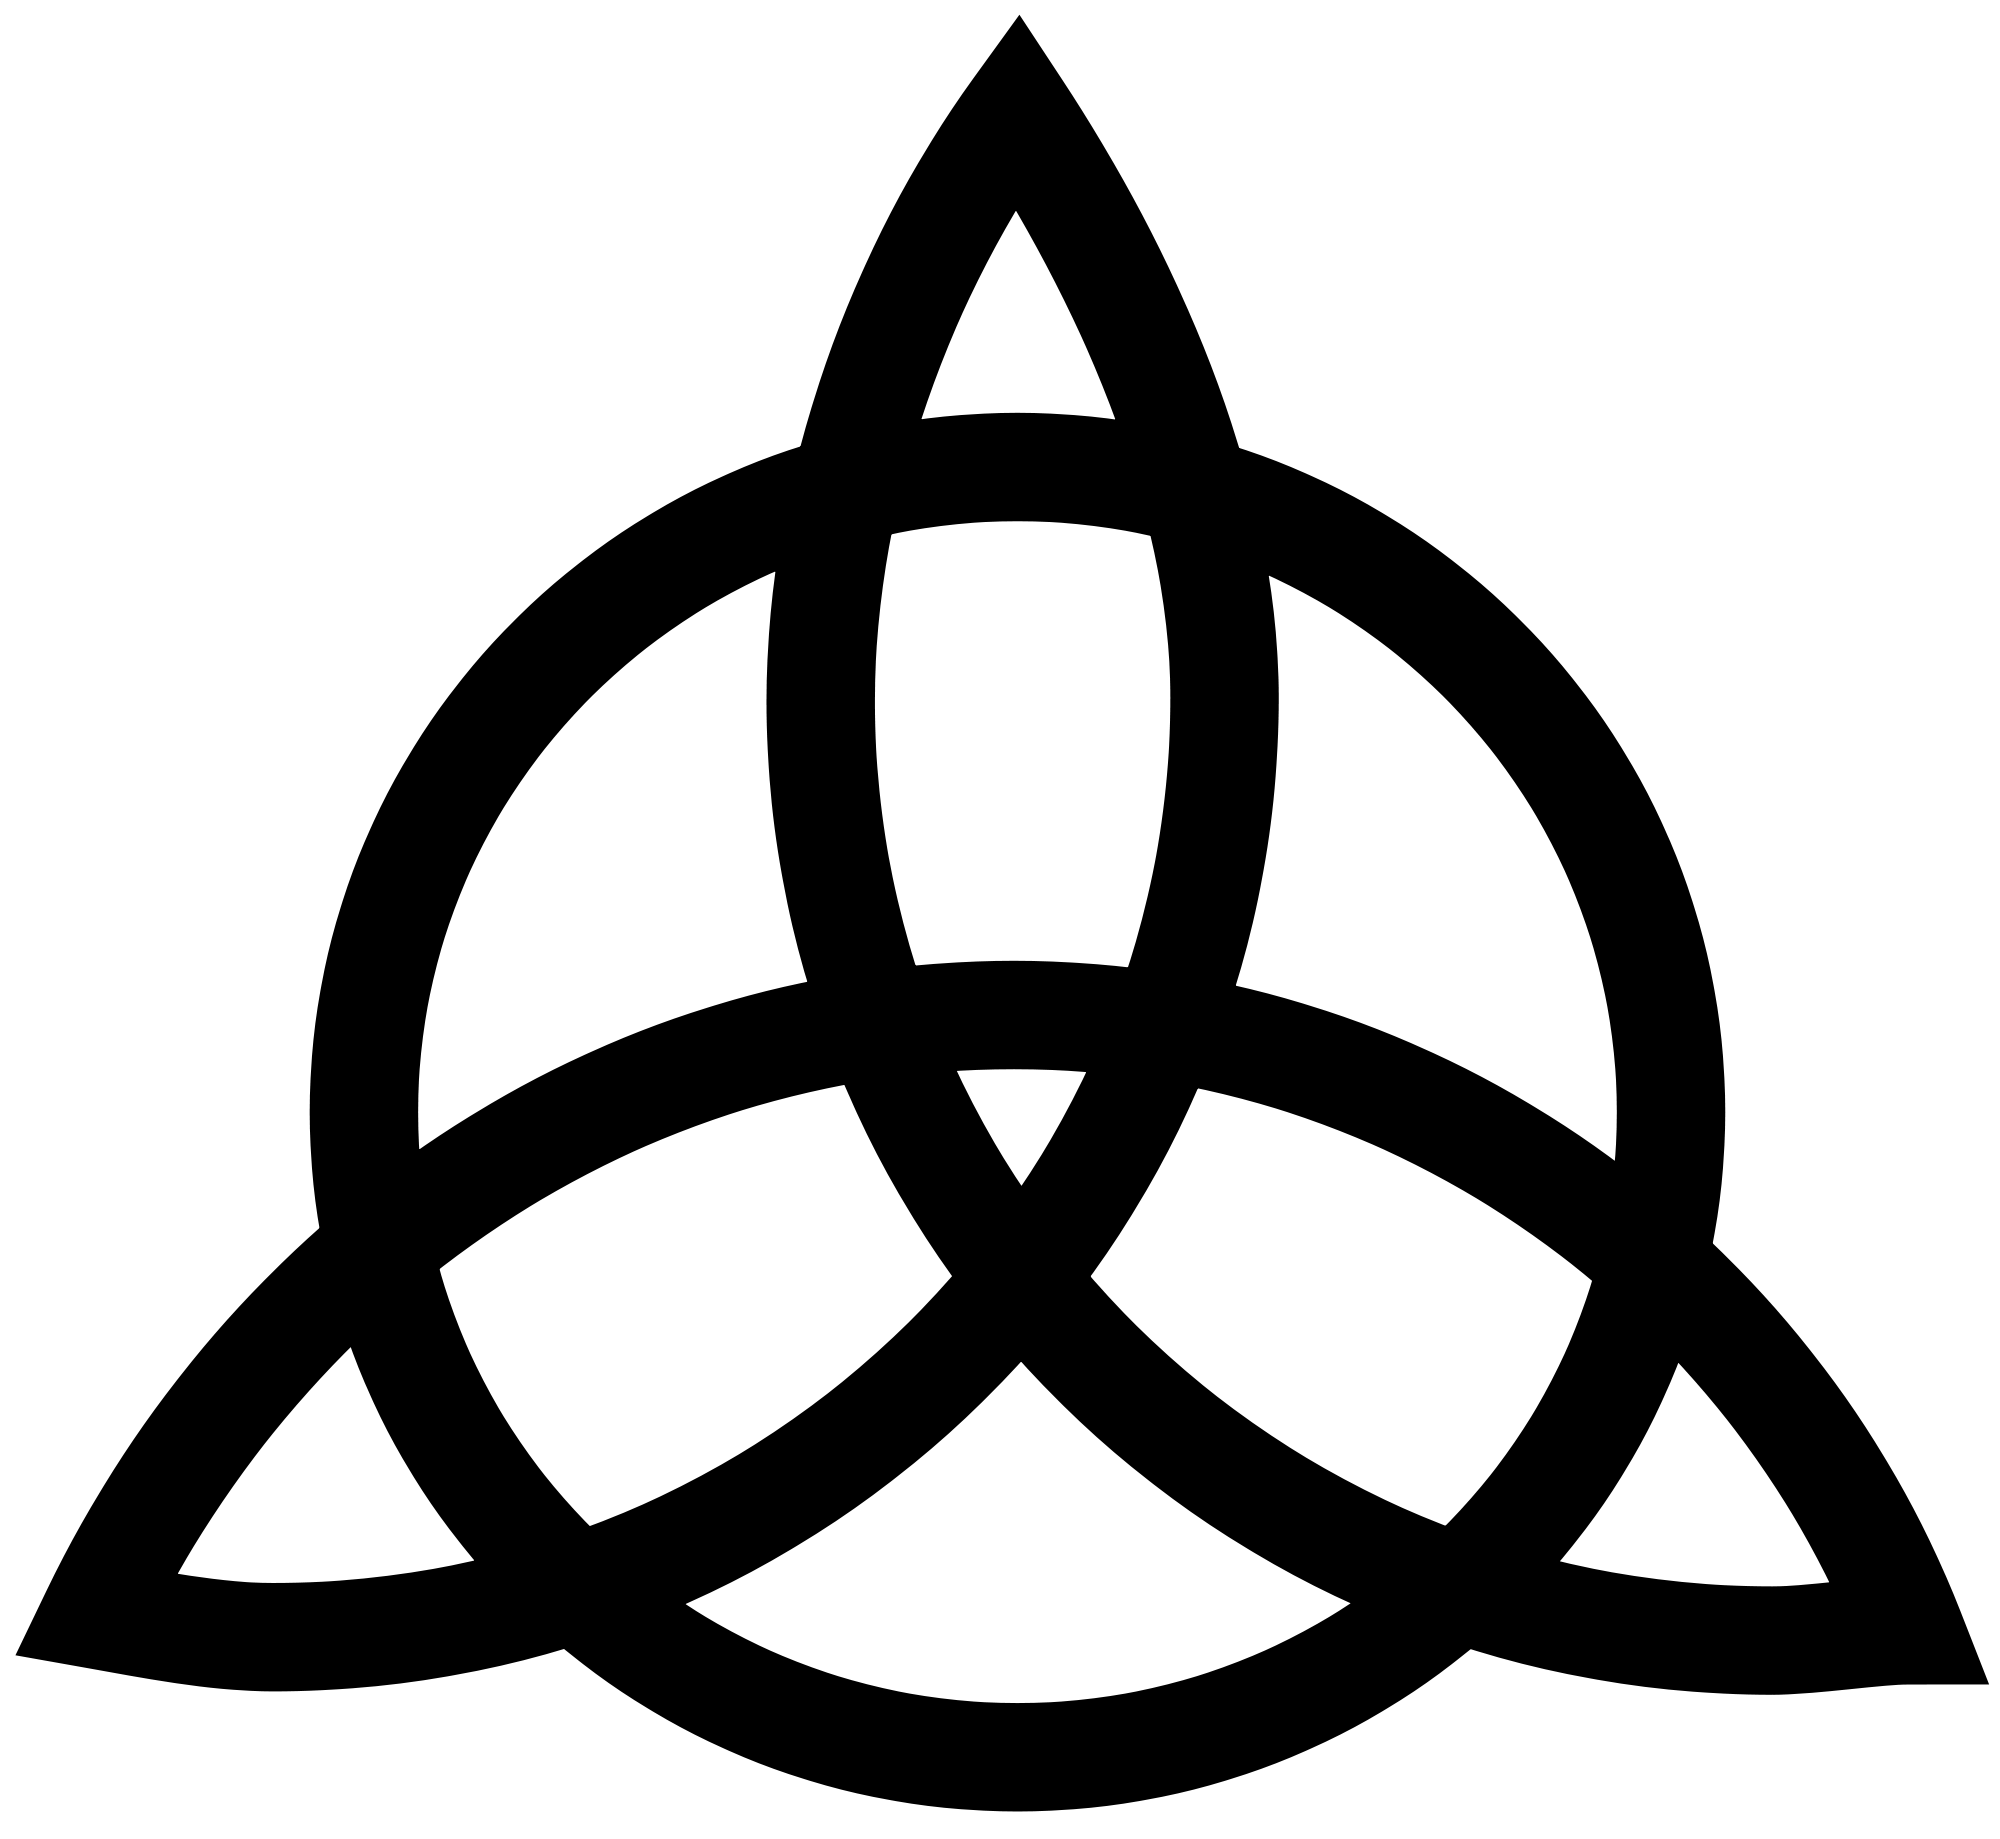 John paul jones sigil interlaced triquetra overlaying circle used john paul jones sigil interlaced triquetra overlaying circle used oon the led zeppelin iv album biocorpaavc